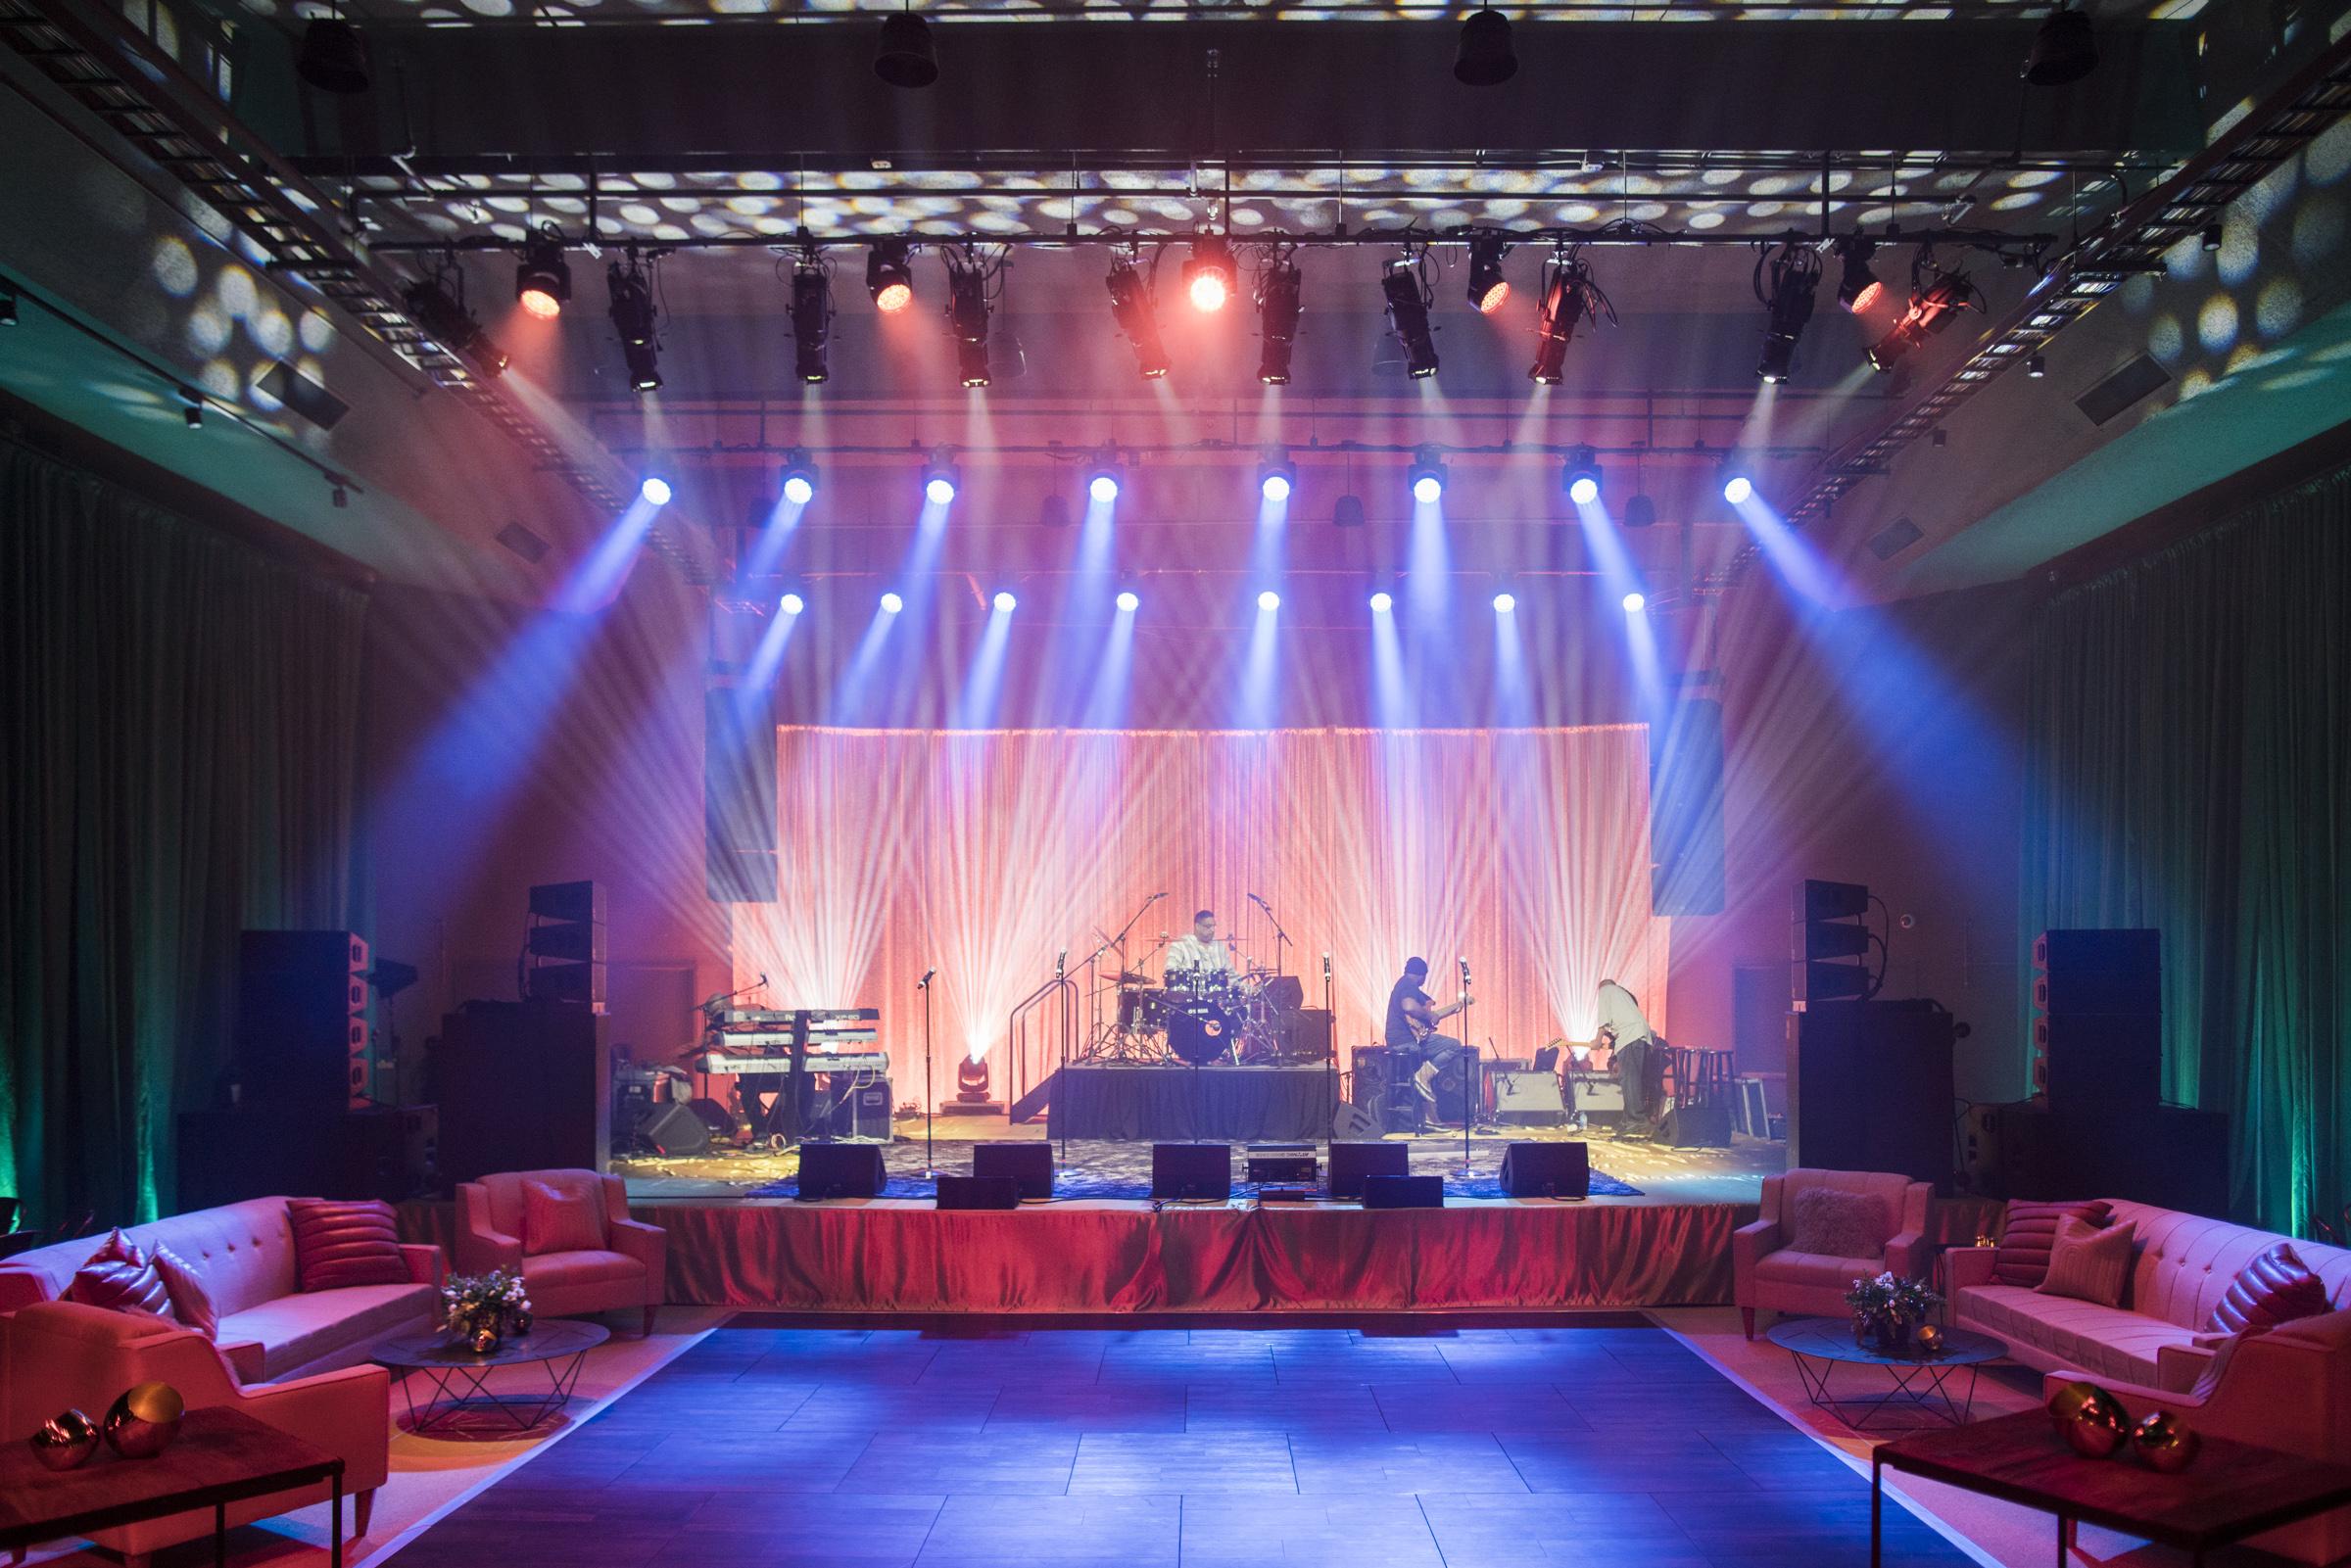 Rafanelli Events Stage Lighting Port Lighting Systems.jpg